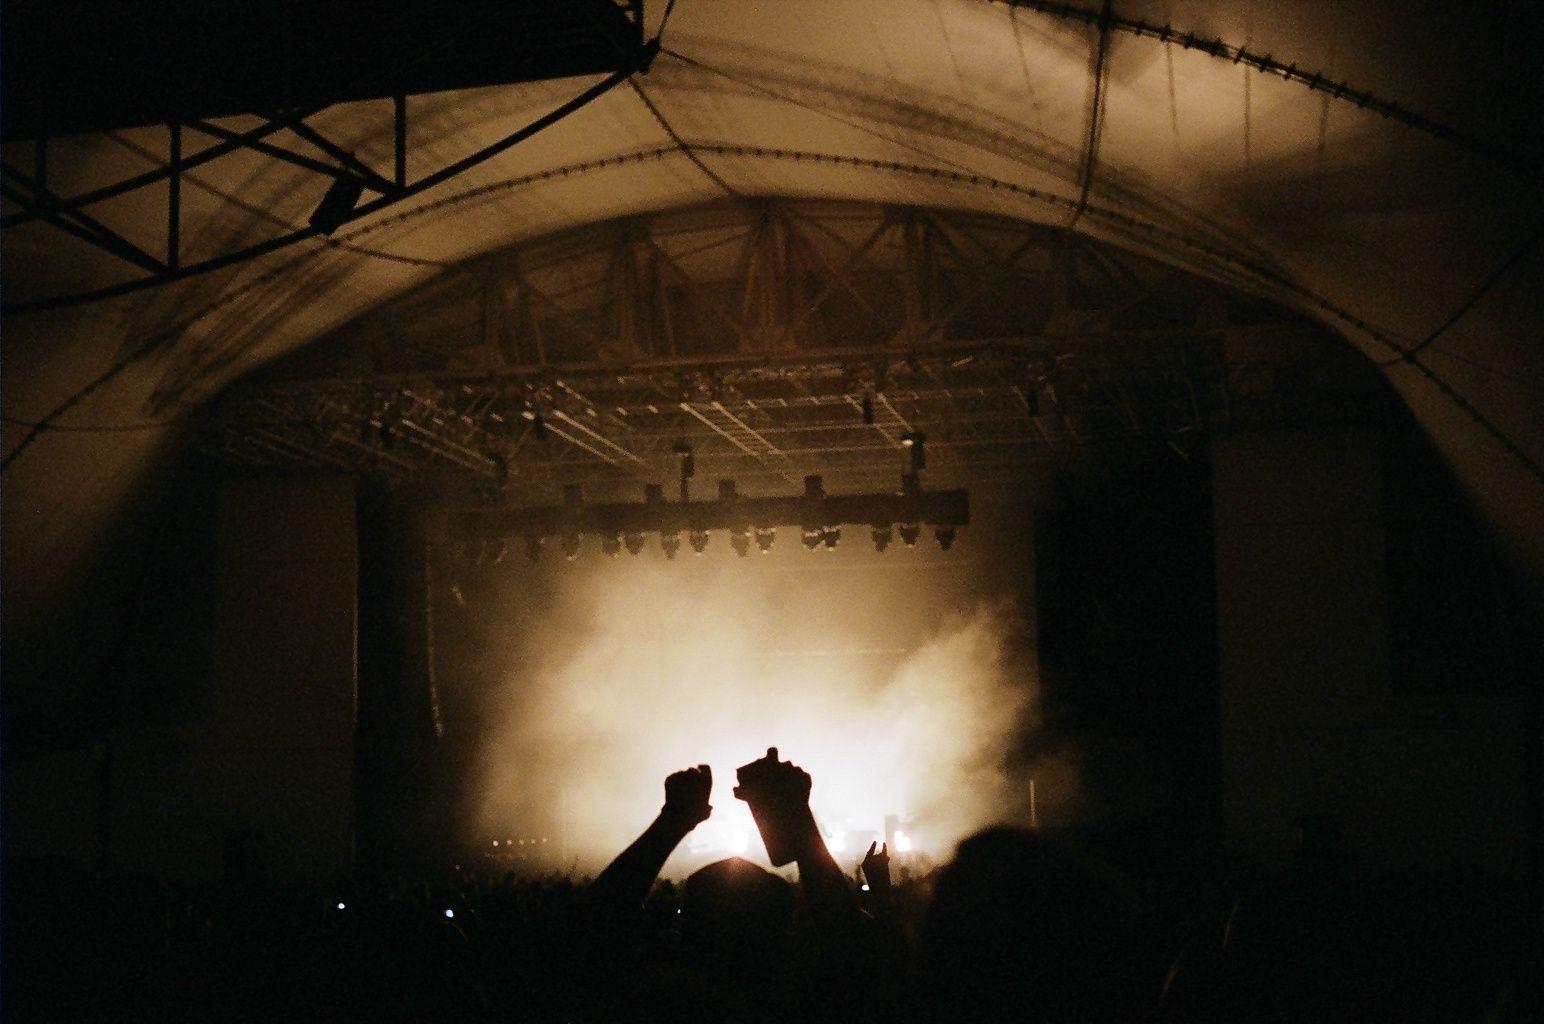 Concert venue outdoors